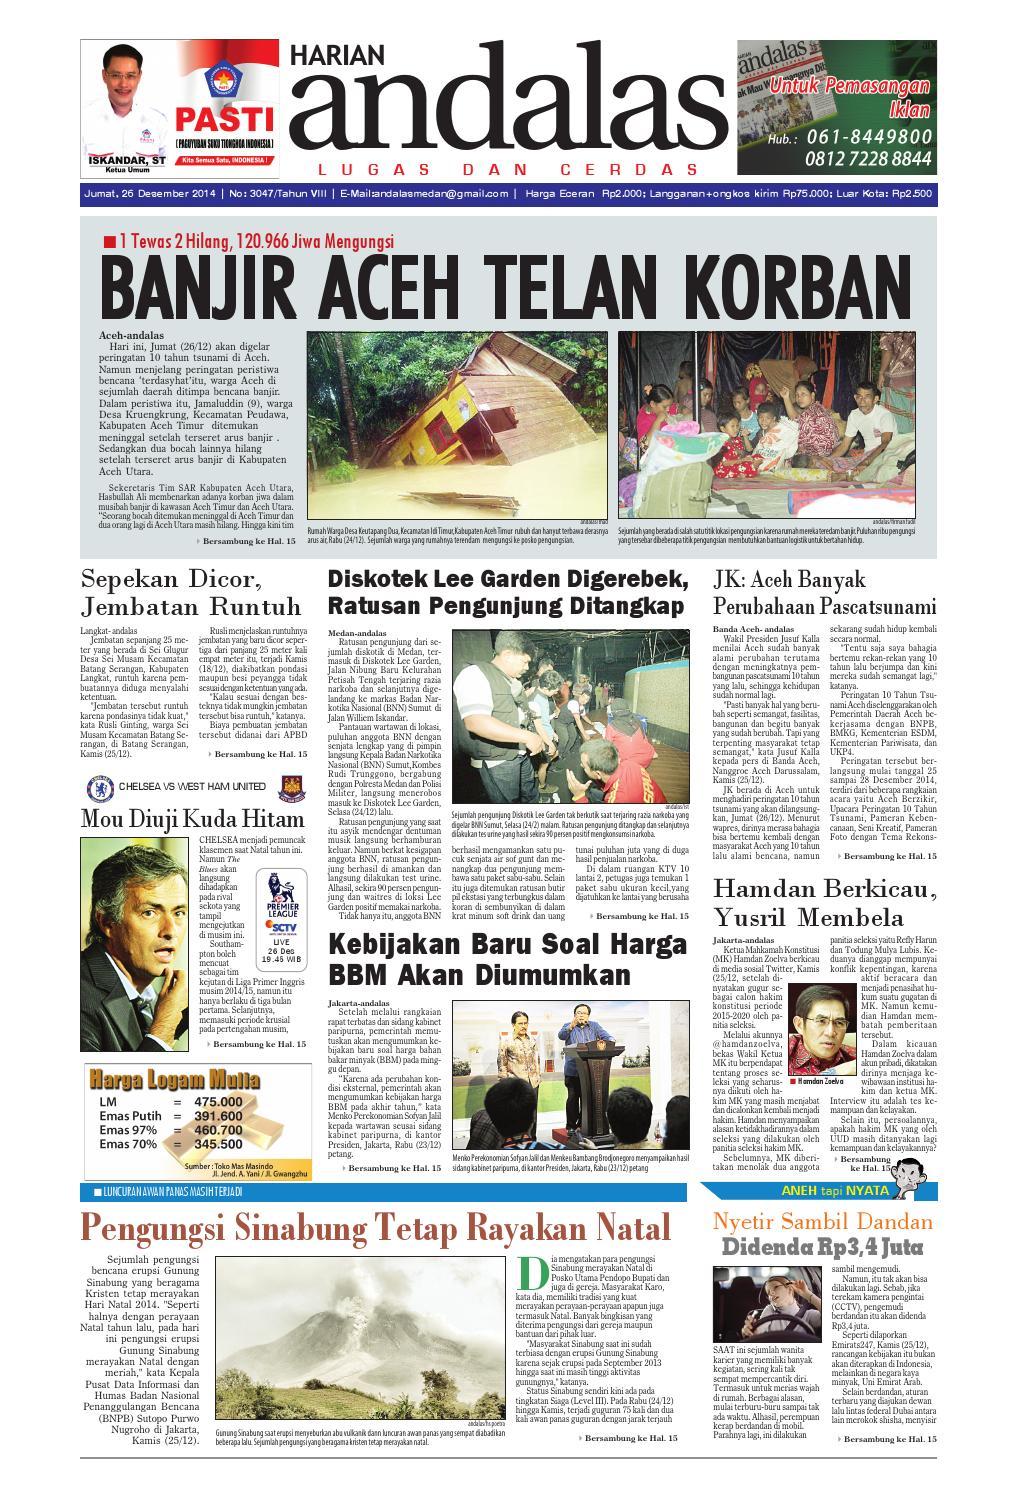 Epaper Andalas Edisi Jumat 26 Desember 2014 By Media Issuu Fcenter Meja Belajar Sd Hk 9004 Sh Jawa Tengah